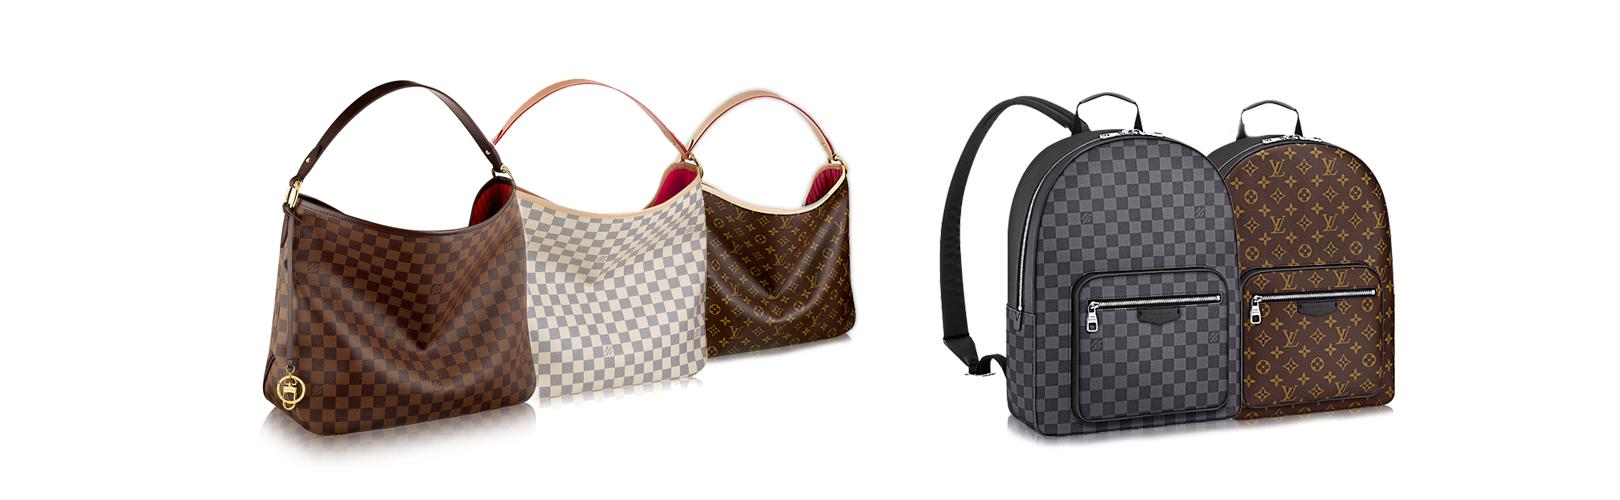 Louis Vuitton τσάντες από €899!!